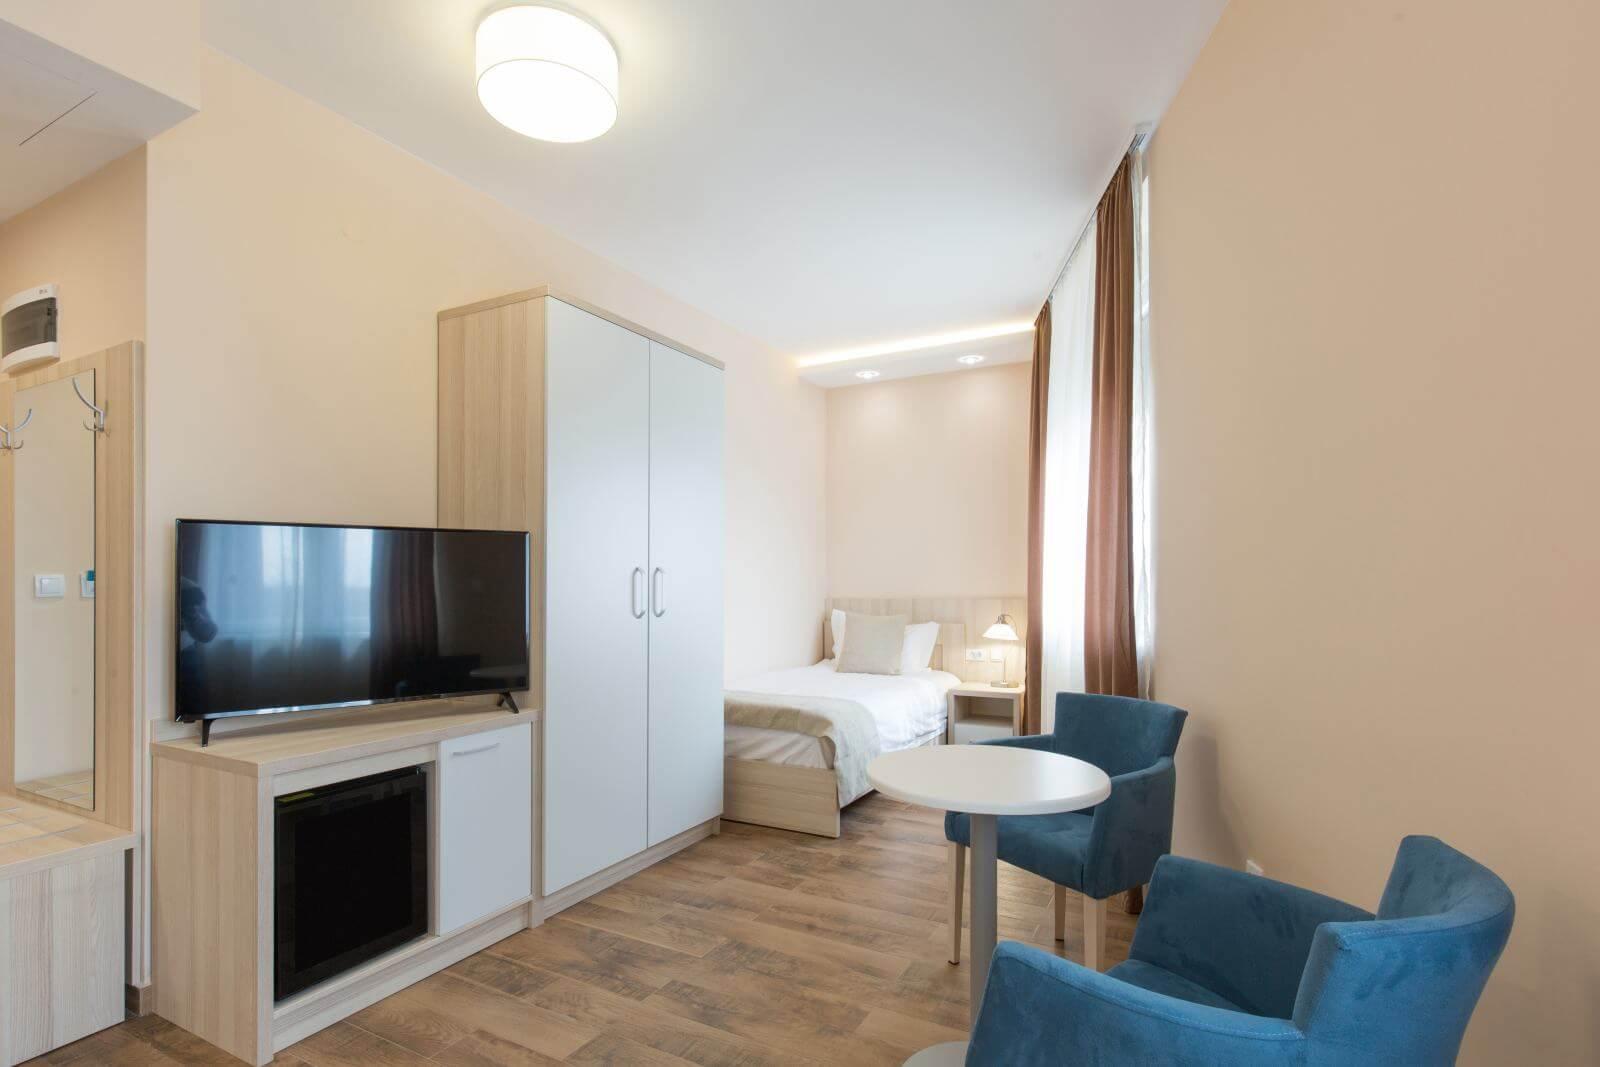 New renovated hotel room interior